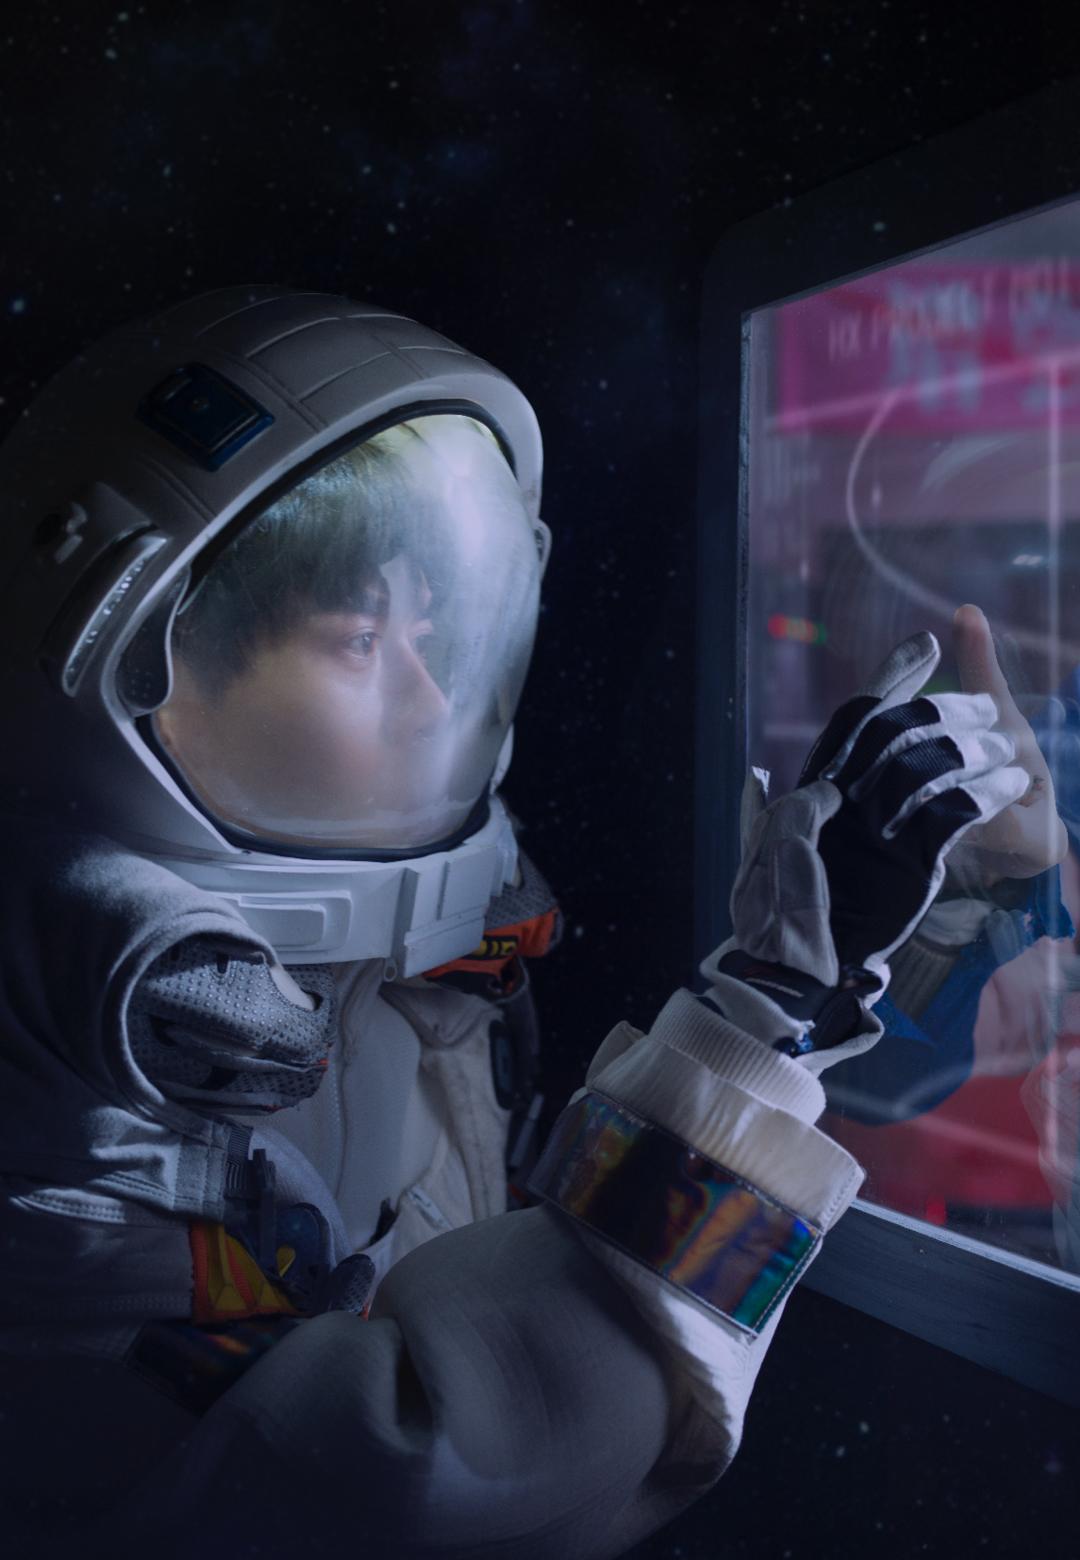 A still from 'Nova' (2019), a video art piece by Cao Fei | Blueprints | Cao Fei | STIRworld